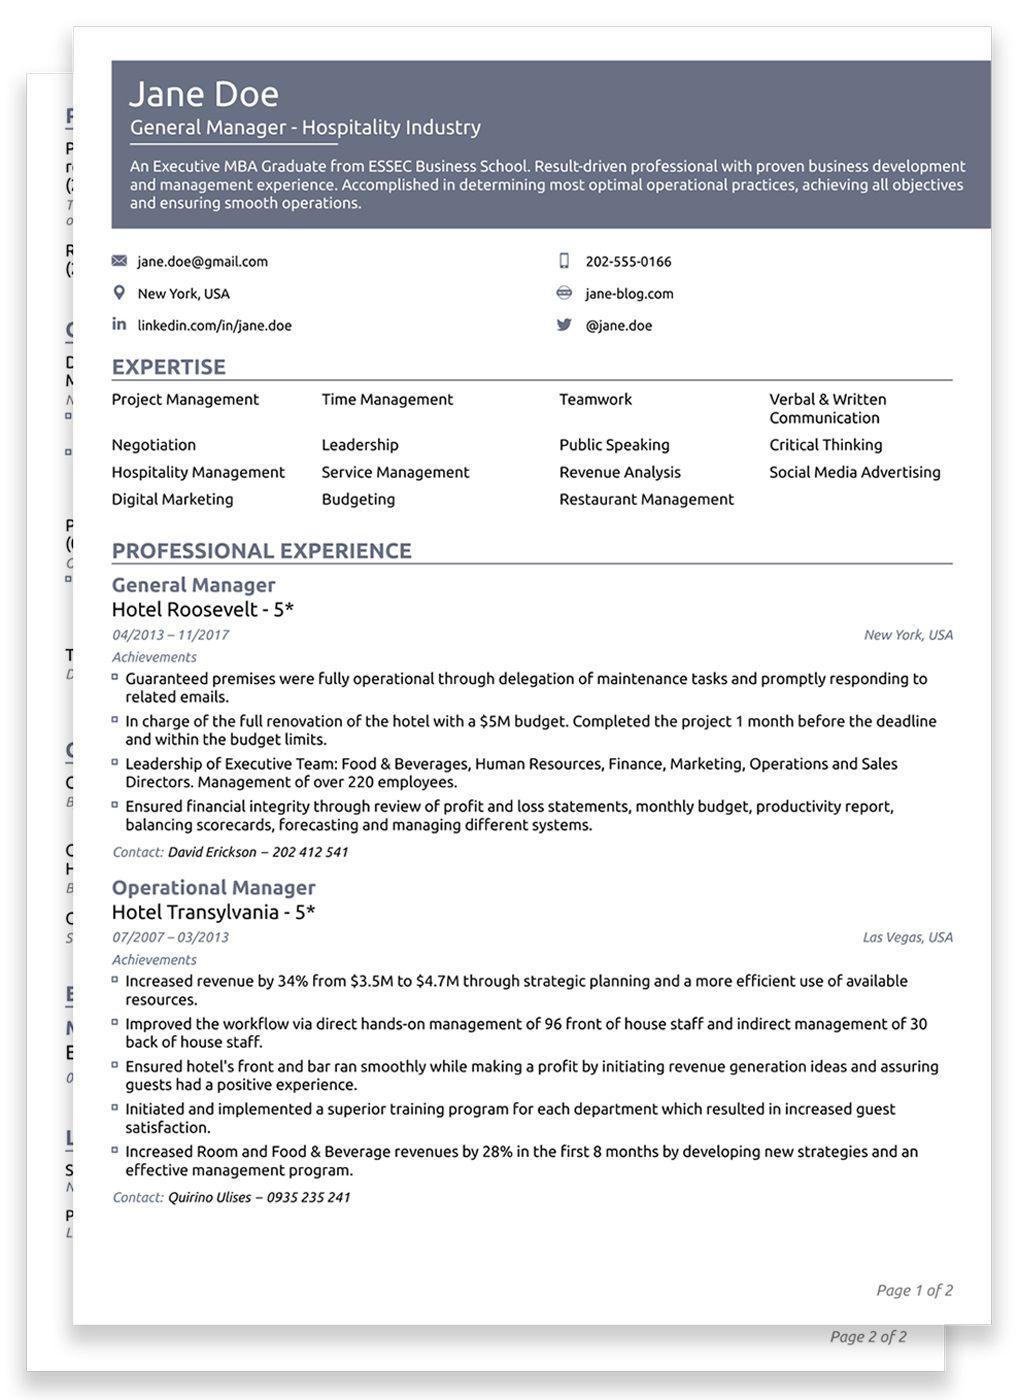 007 Unbelievable Best Professional Resume Template Image  Reddit 2020 DownloadFull